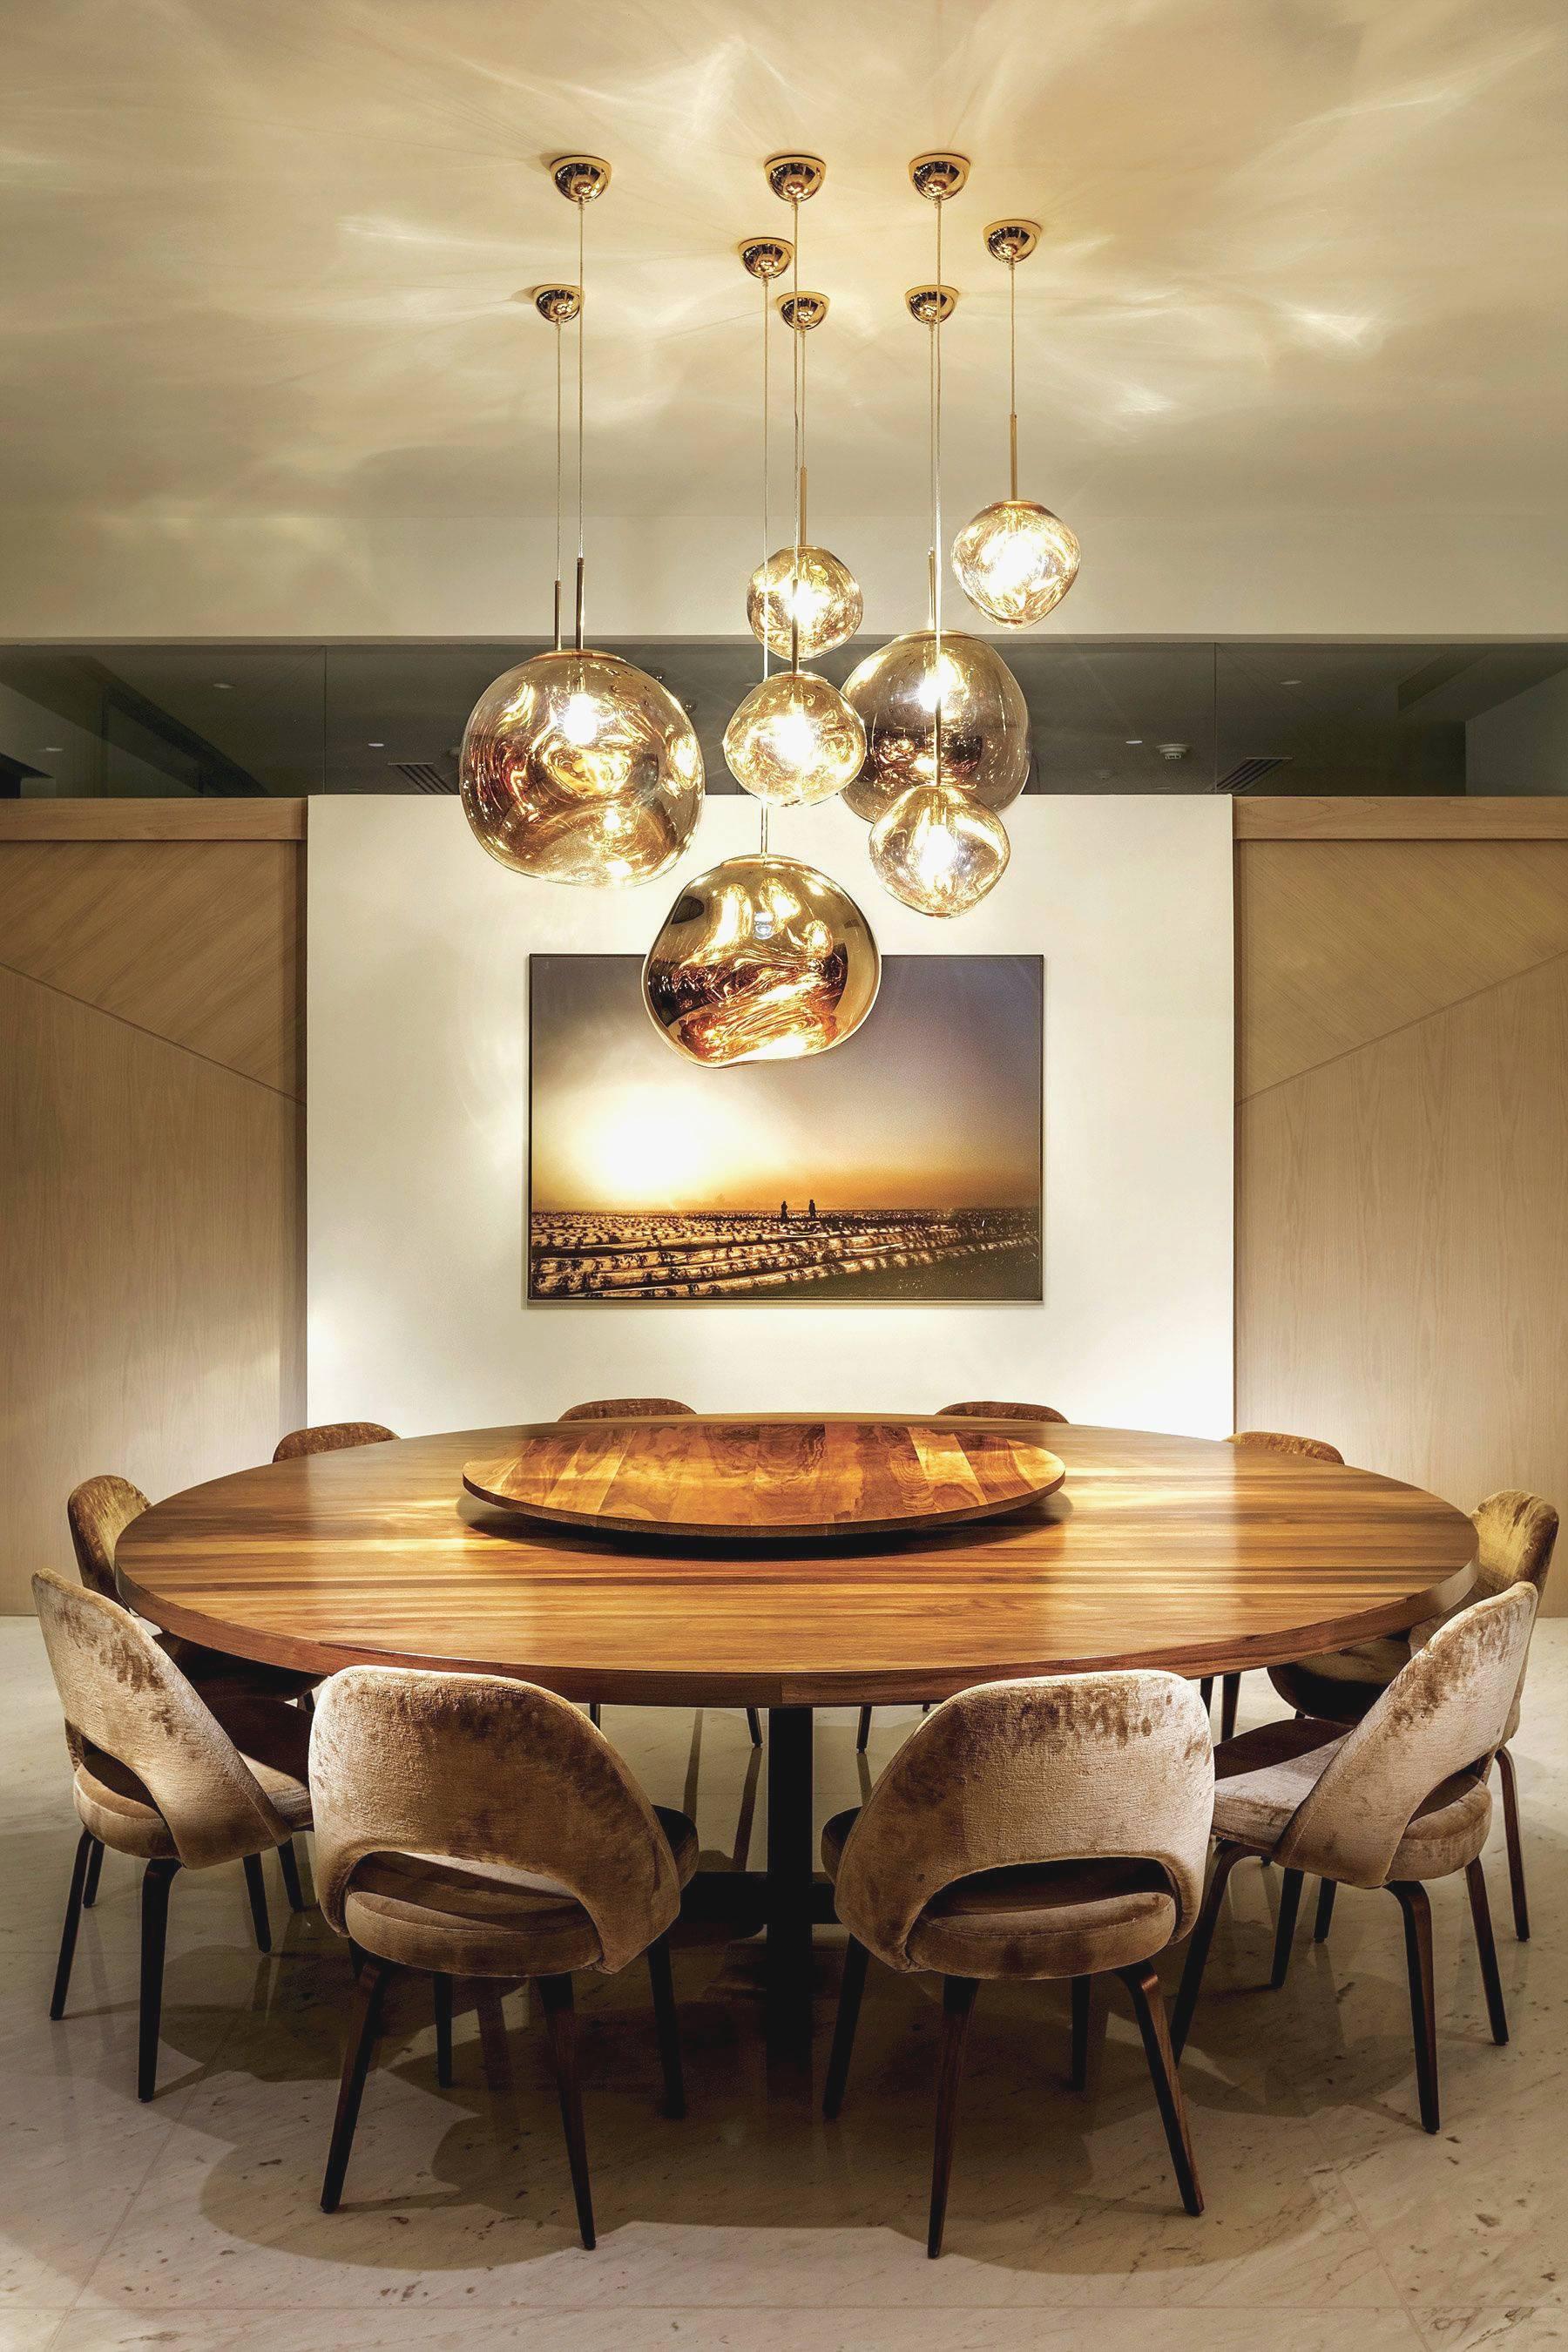 wood coffee table houzz trends 41 elegant bedroom ideas houzz of wood coffee table houzz